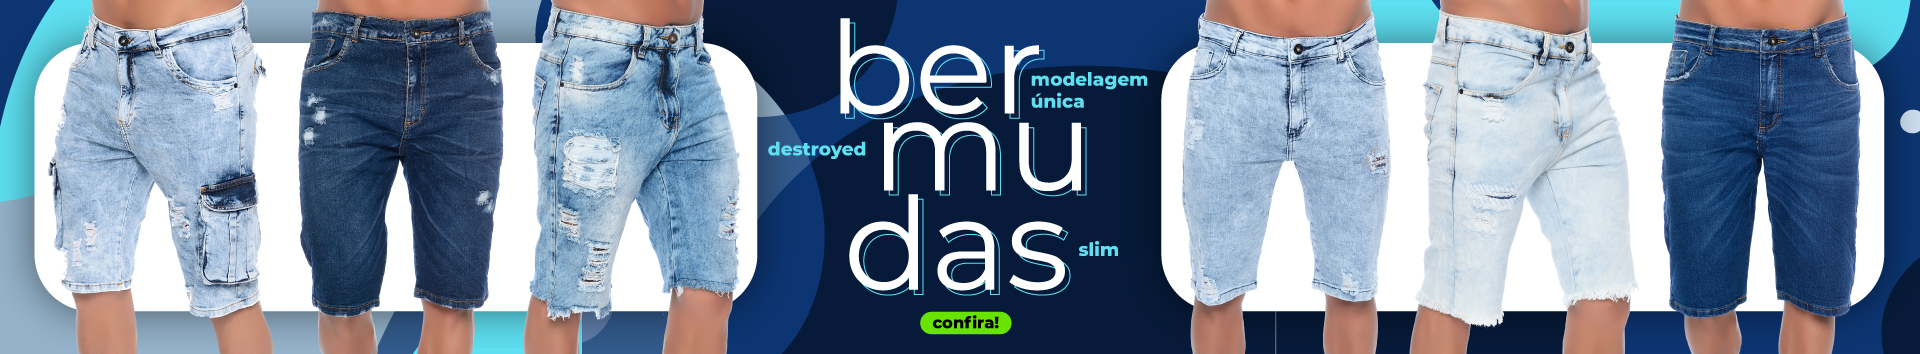 Minibanner-Desktop-bermuda jeans